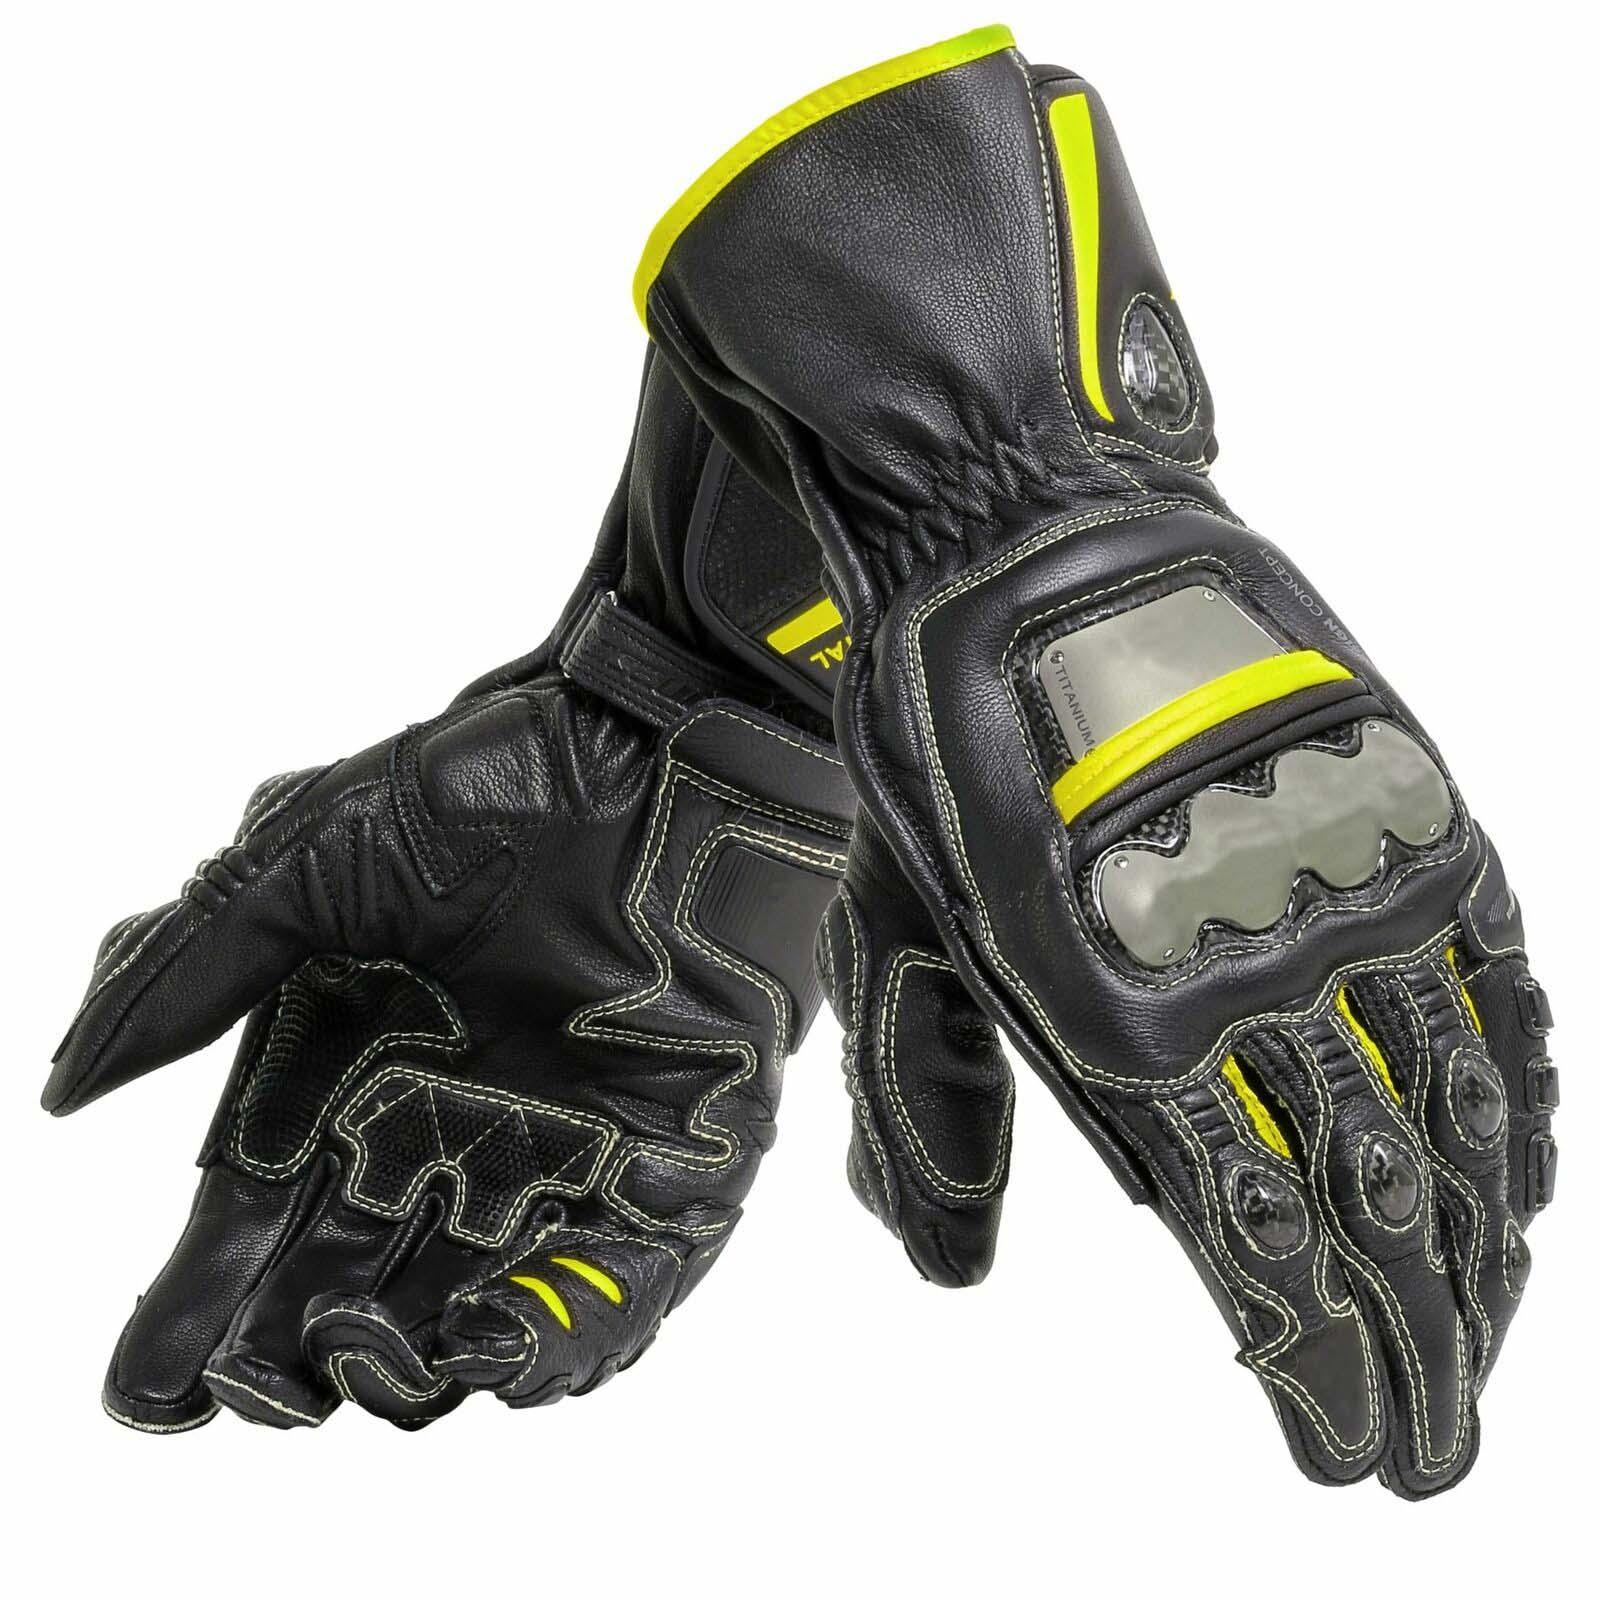 Genuine Leather Dain Full Metal 6 Motorcycle Long Gloves Anti Fall Titanium Motorbike Gloves Racing Motocross Gloves